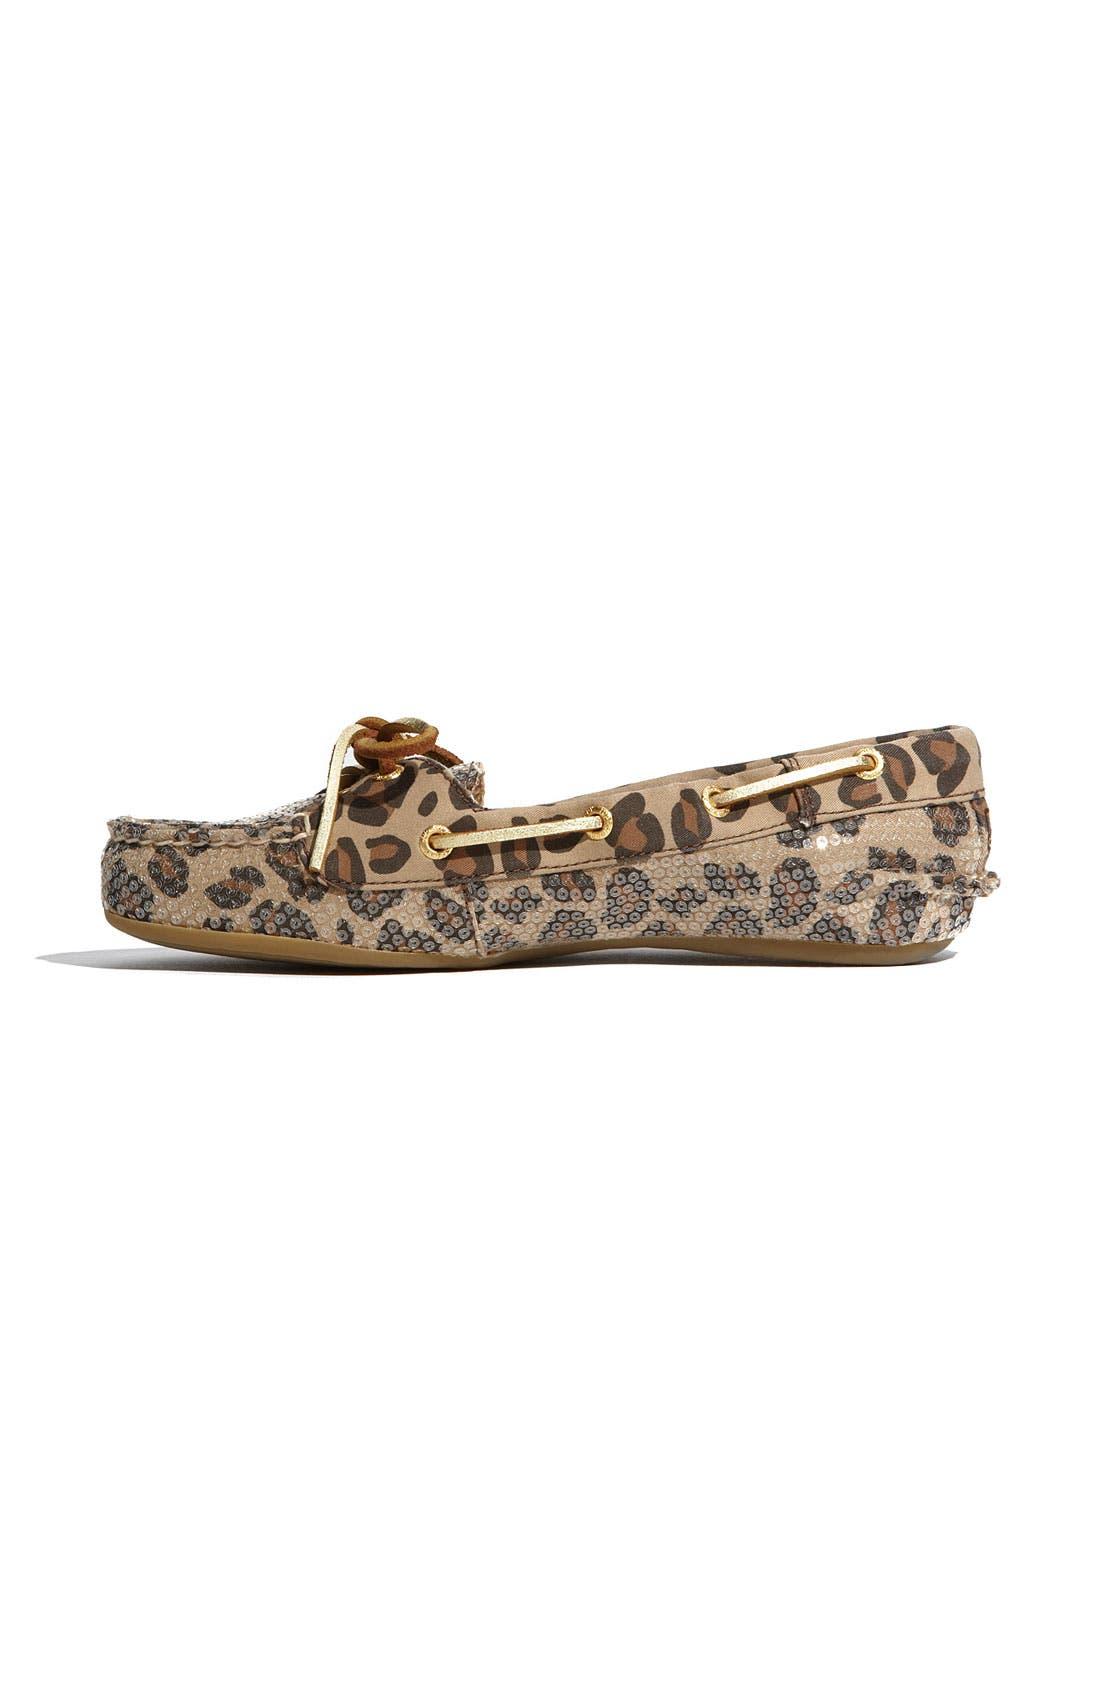 Top-Sider<sup>®</sup> 'Skiff' Moccasin Slip-On,                             Alternate thumbnail 2, color,                             Leopard Sequins